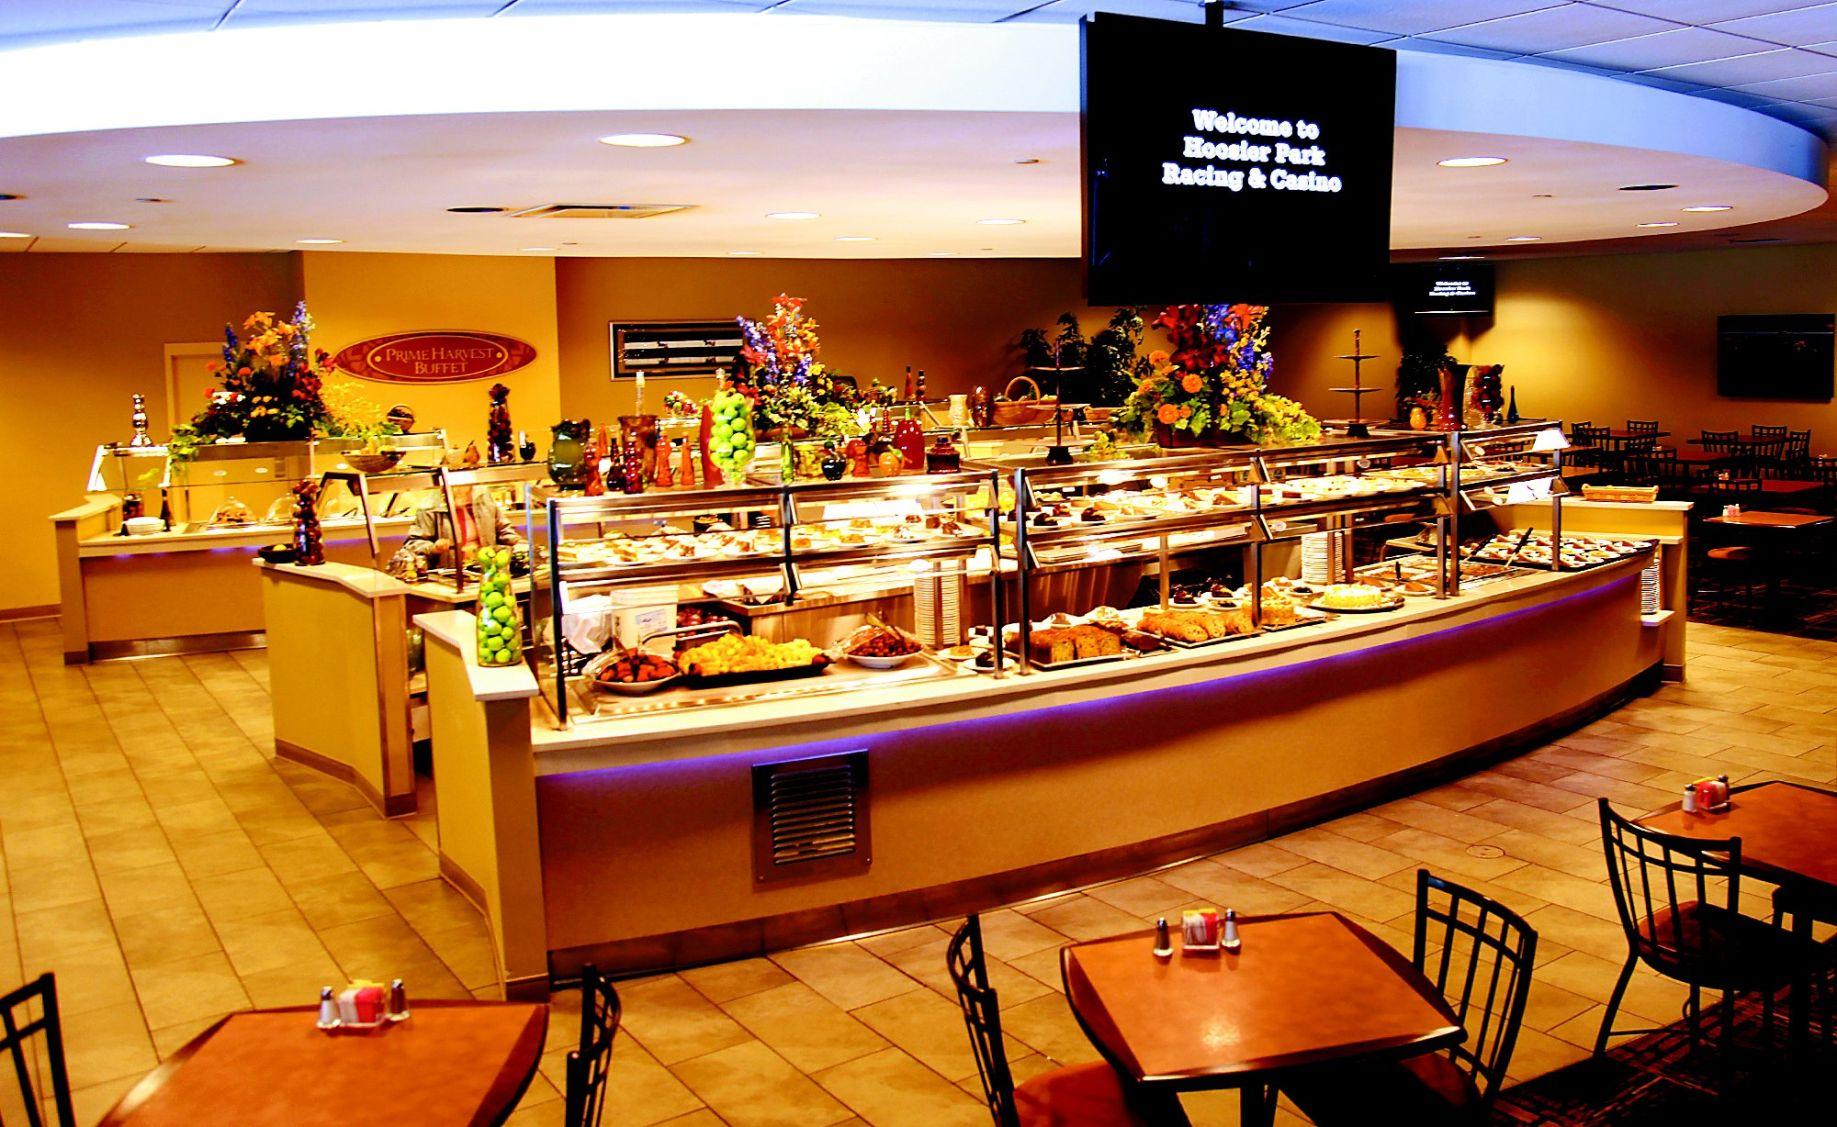 hoosier park grabs three best of awards archives rh heraldbulletin com hoosier park buffet menu hoosier park buffet prices